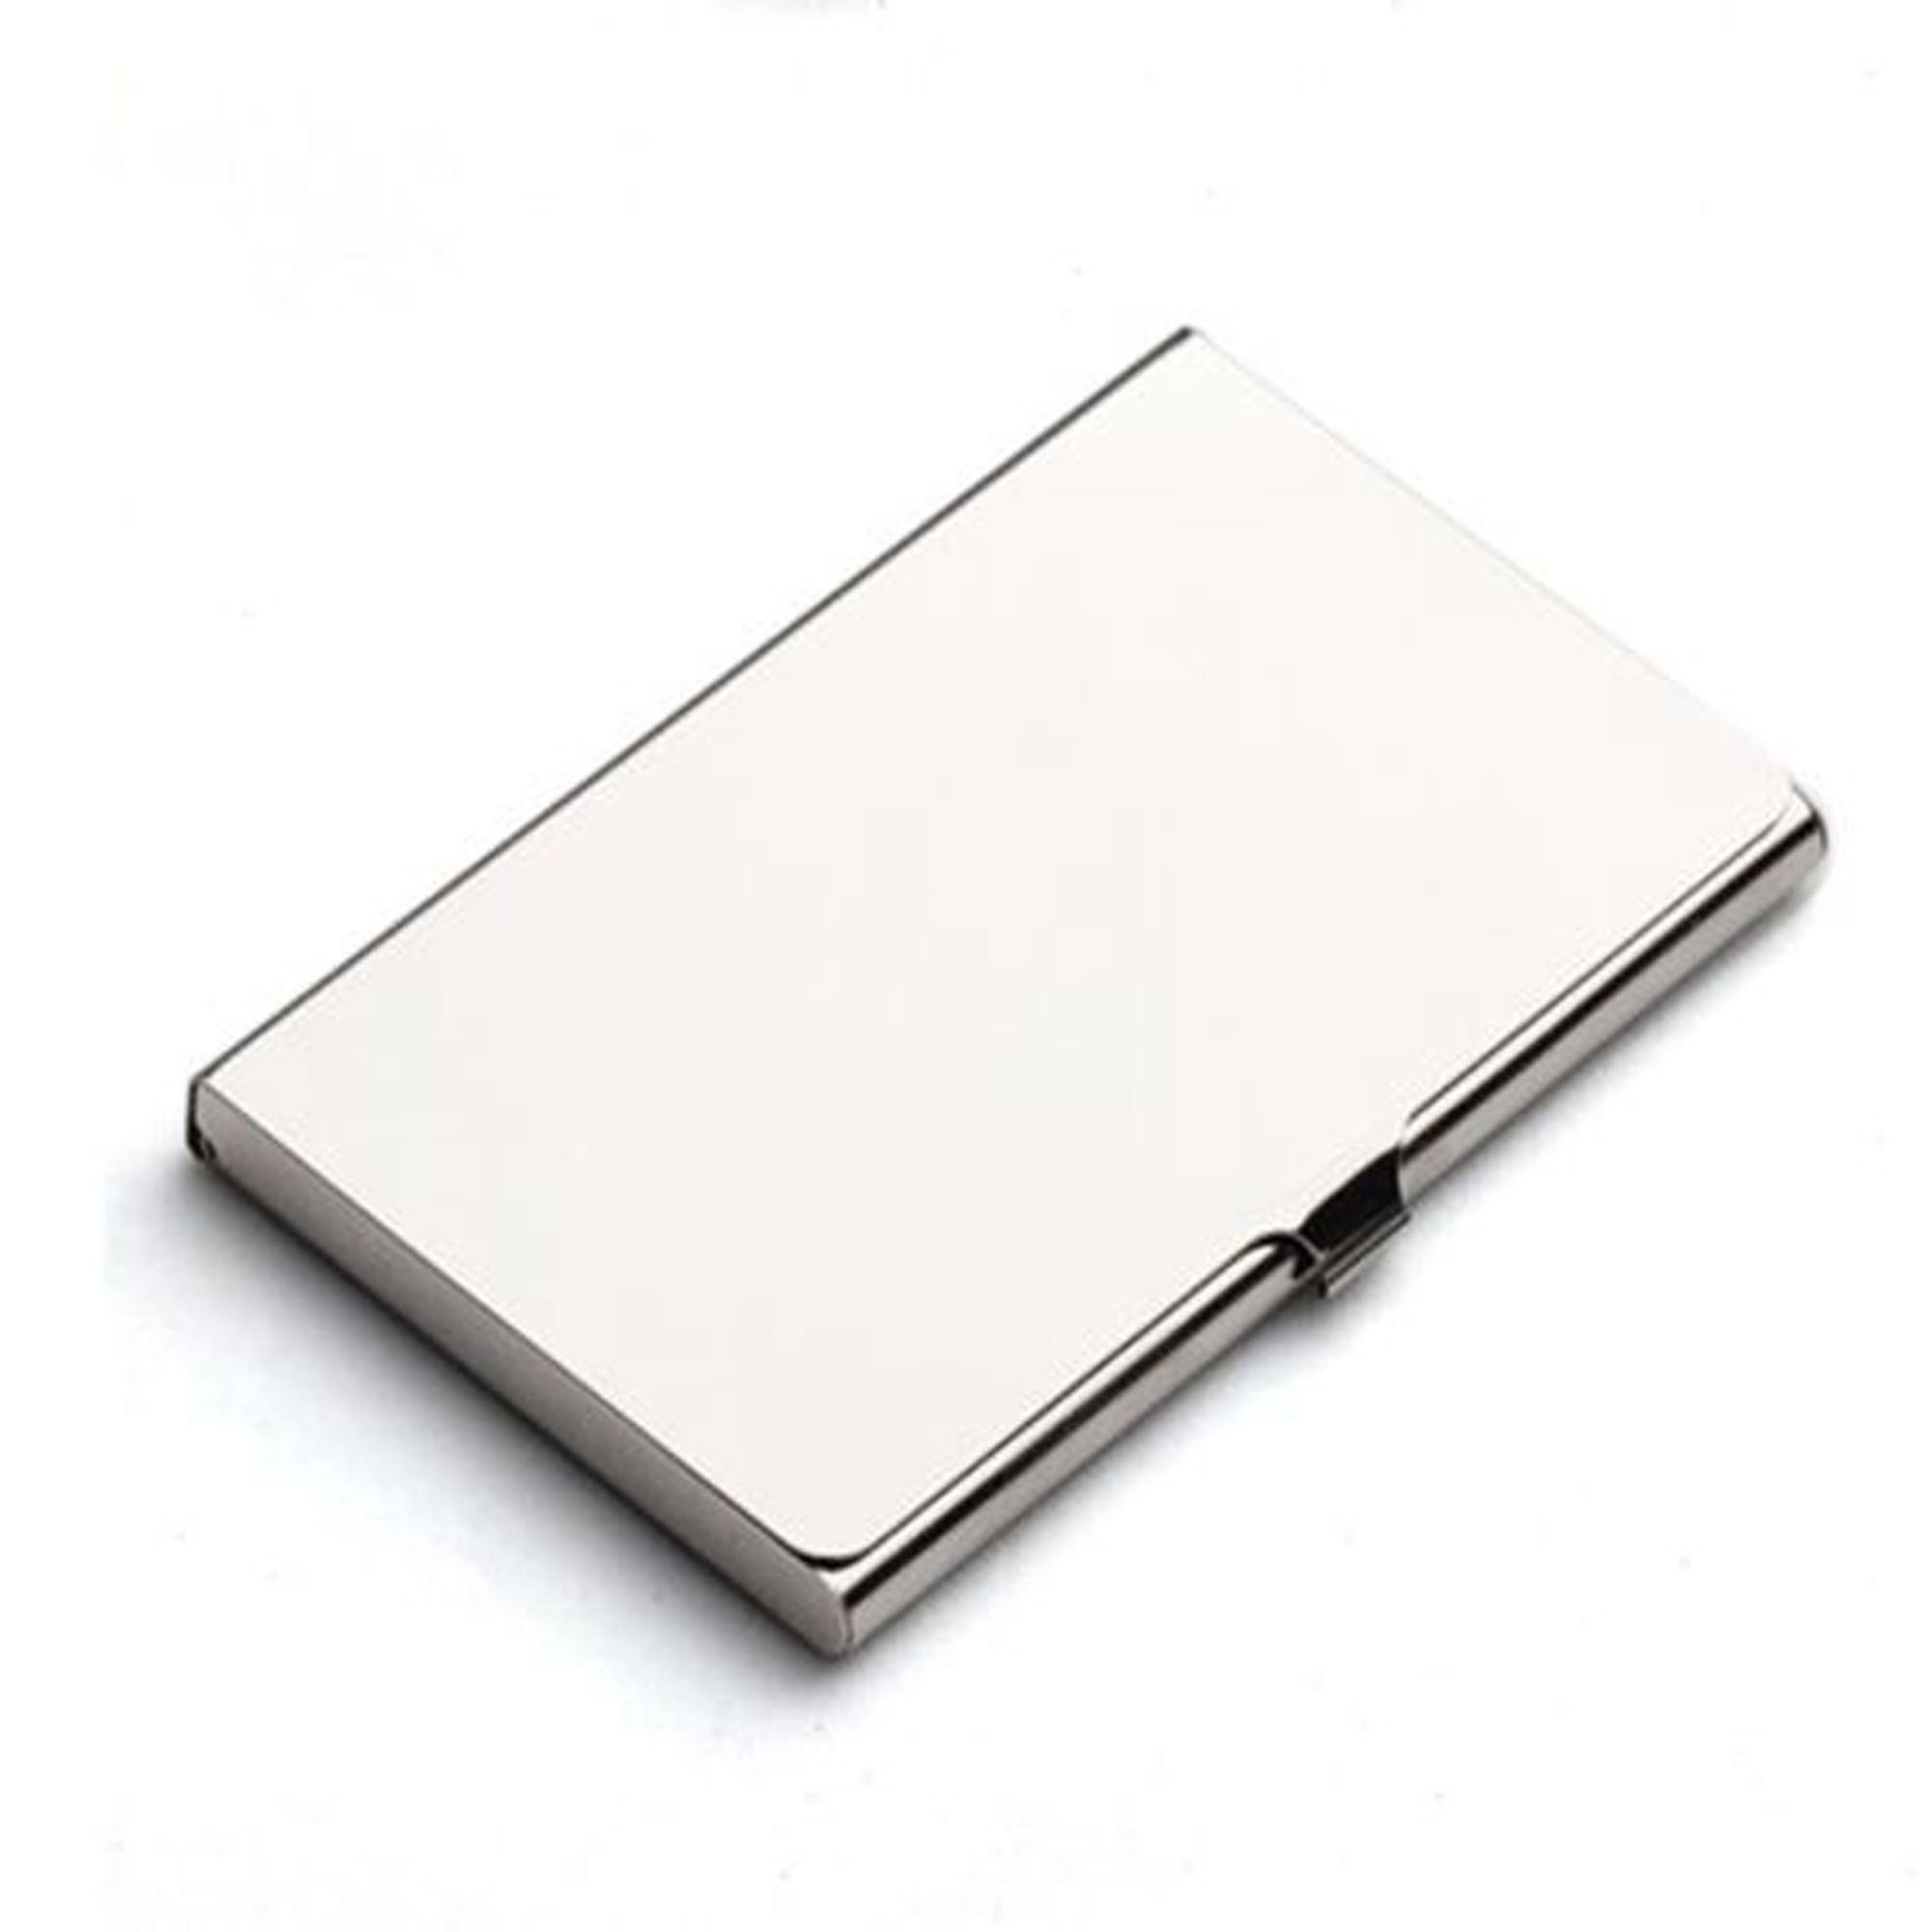 Pocket Stainless Steel /& Metal Business Card Holder Case ID Wallet SilvervecJB